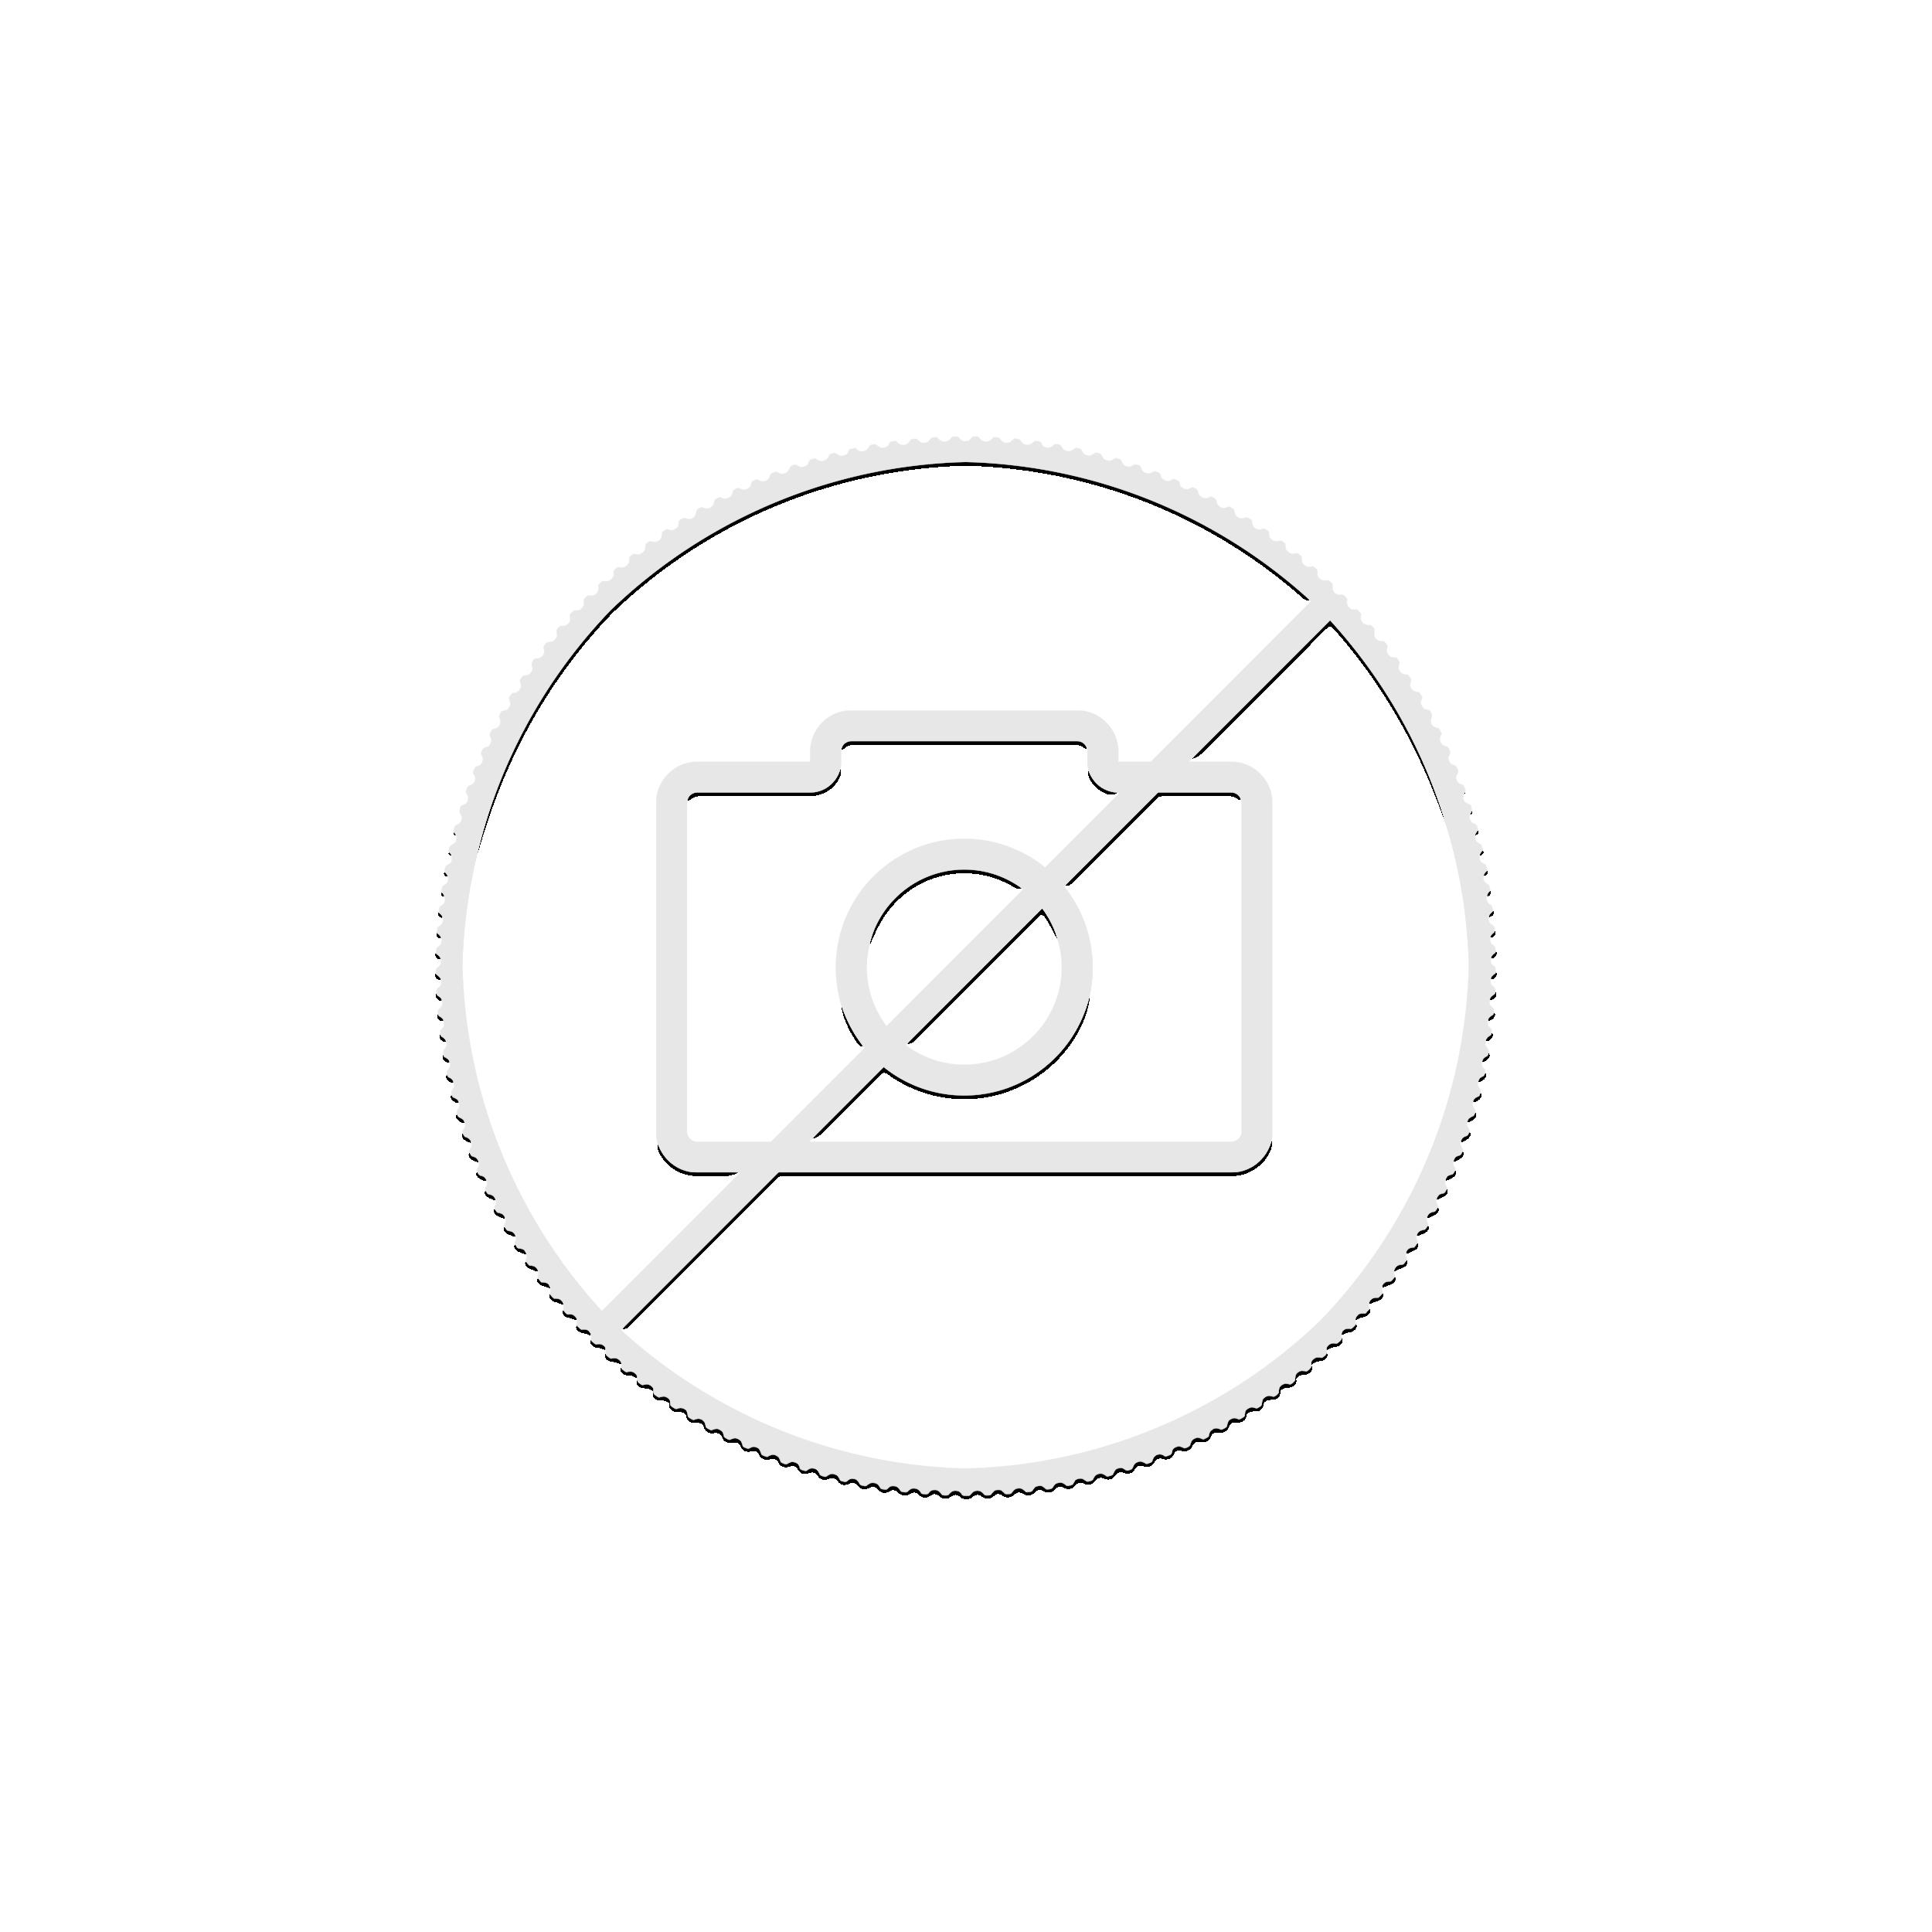 Saltwater Crocodile - 1 troy ounce zilveren munt 2014